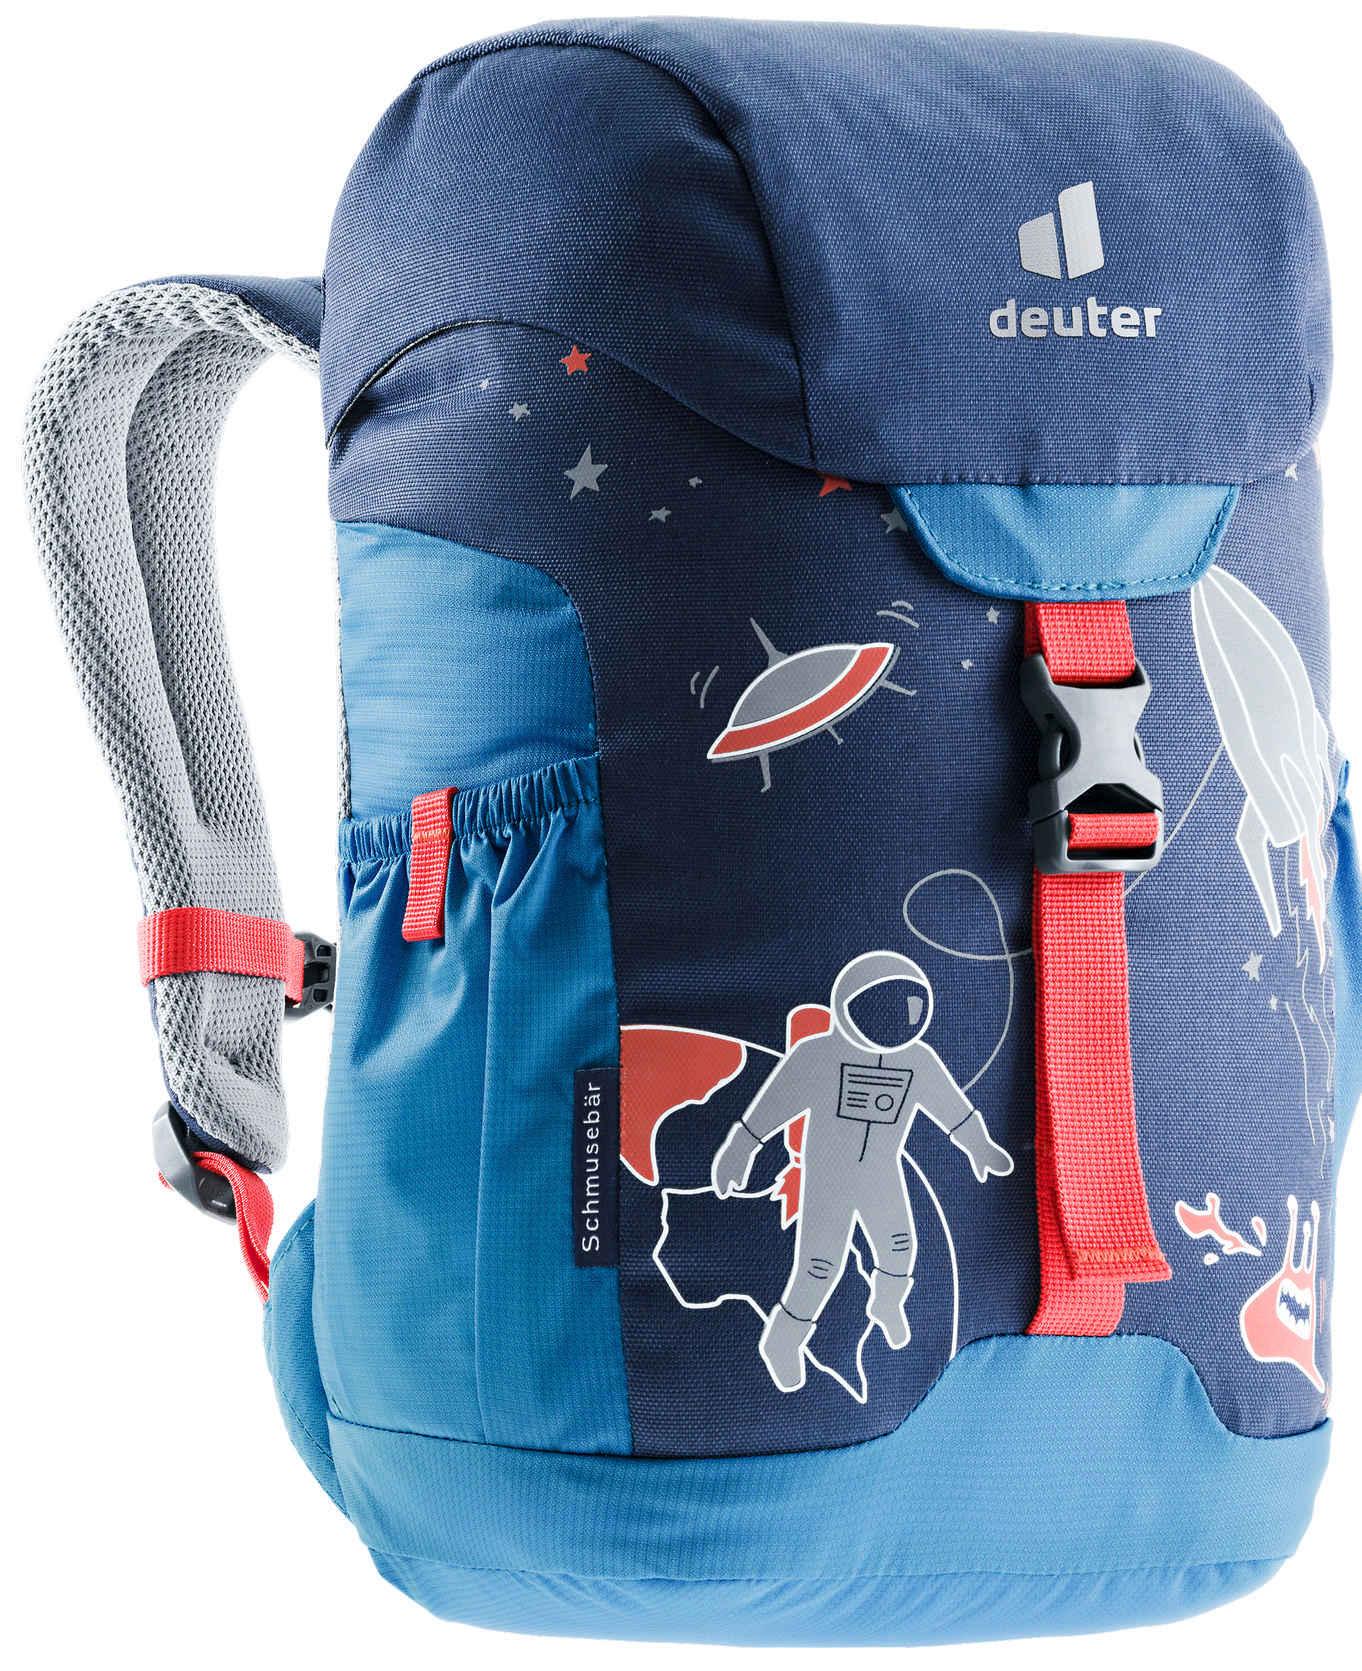 Детские рюкзаки Рюкзак детский Deuter Schmusebar 8 (2021) 3610121-3303-Schmusebaer-w19-d0.jpg